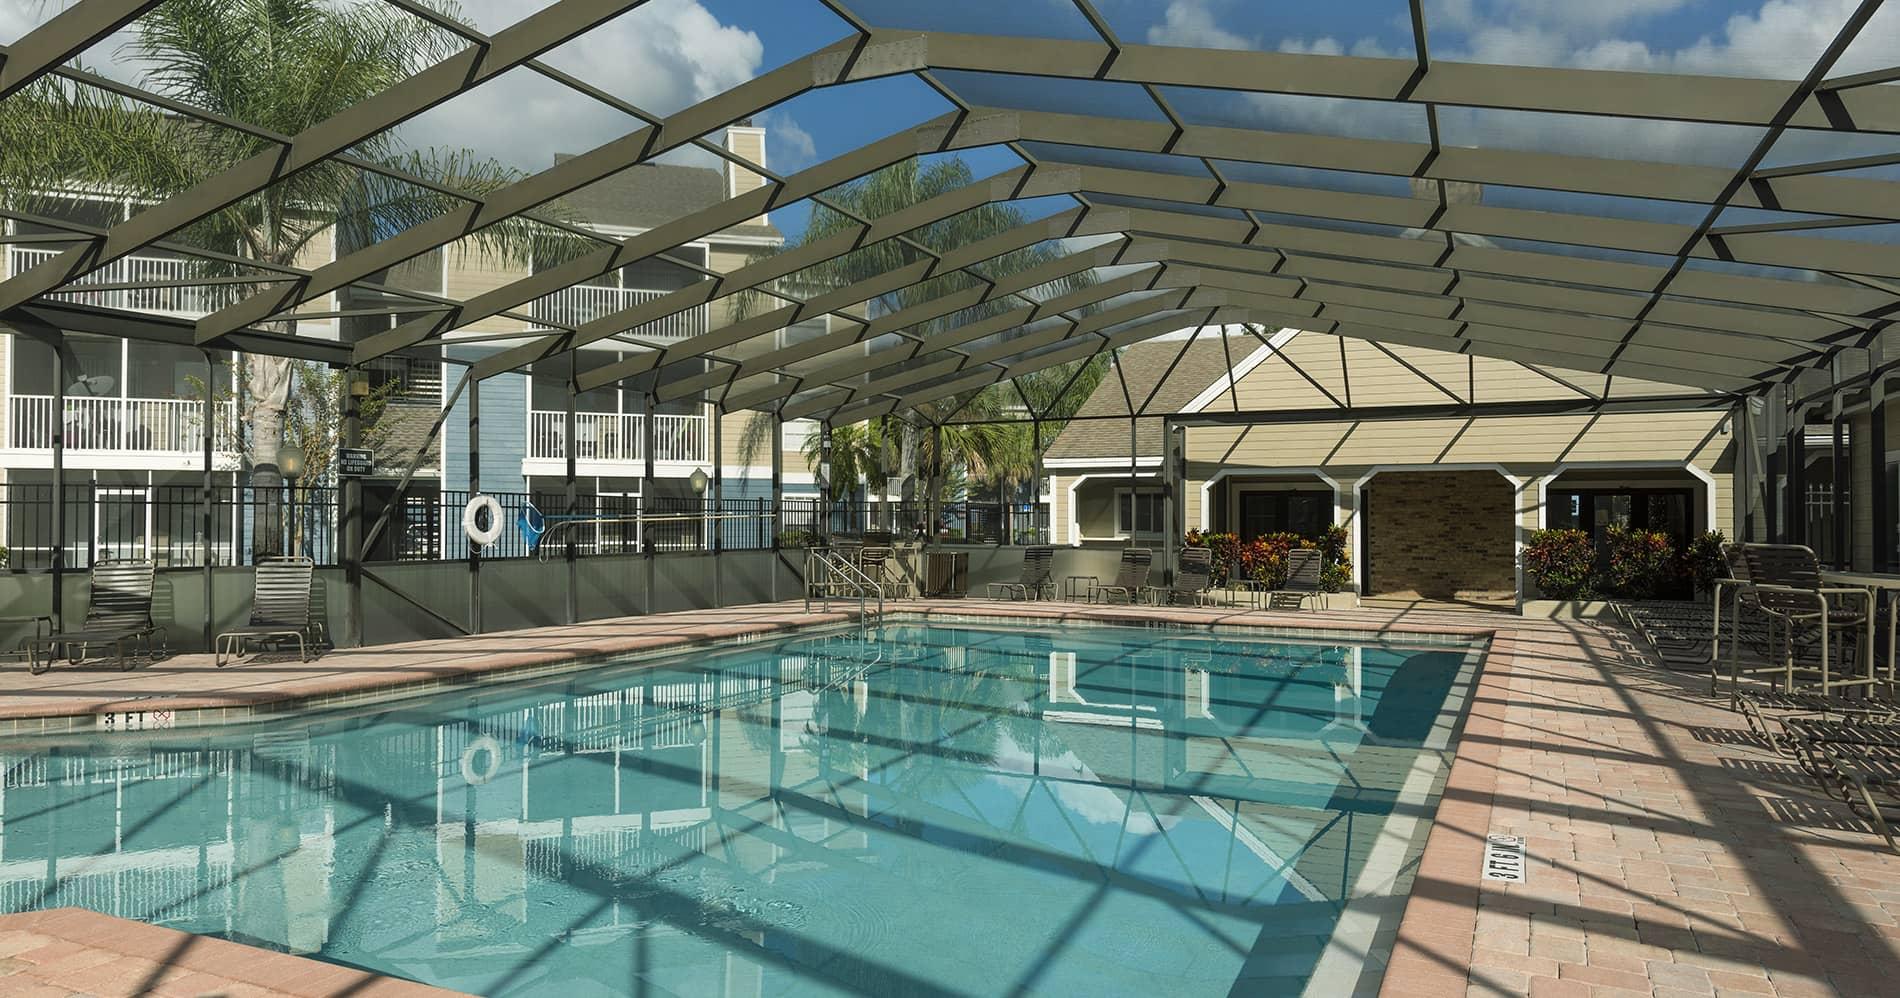 Regatta Shores Apartments In North Sanford Fl